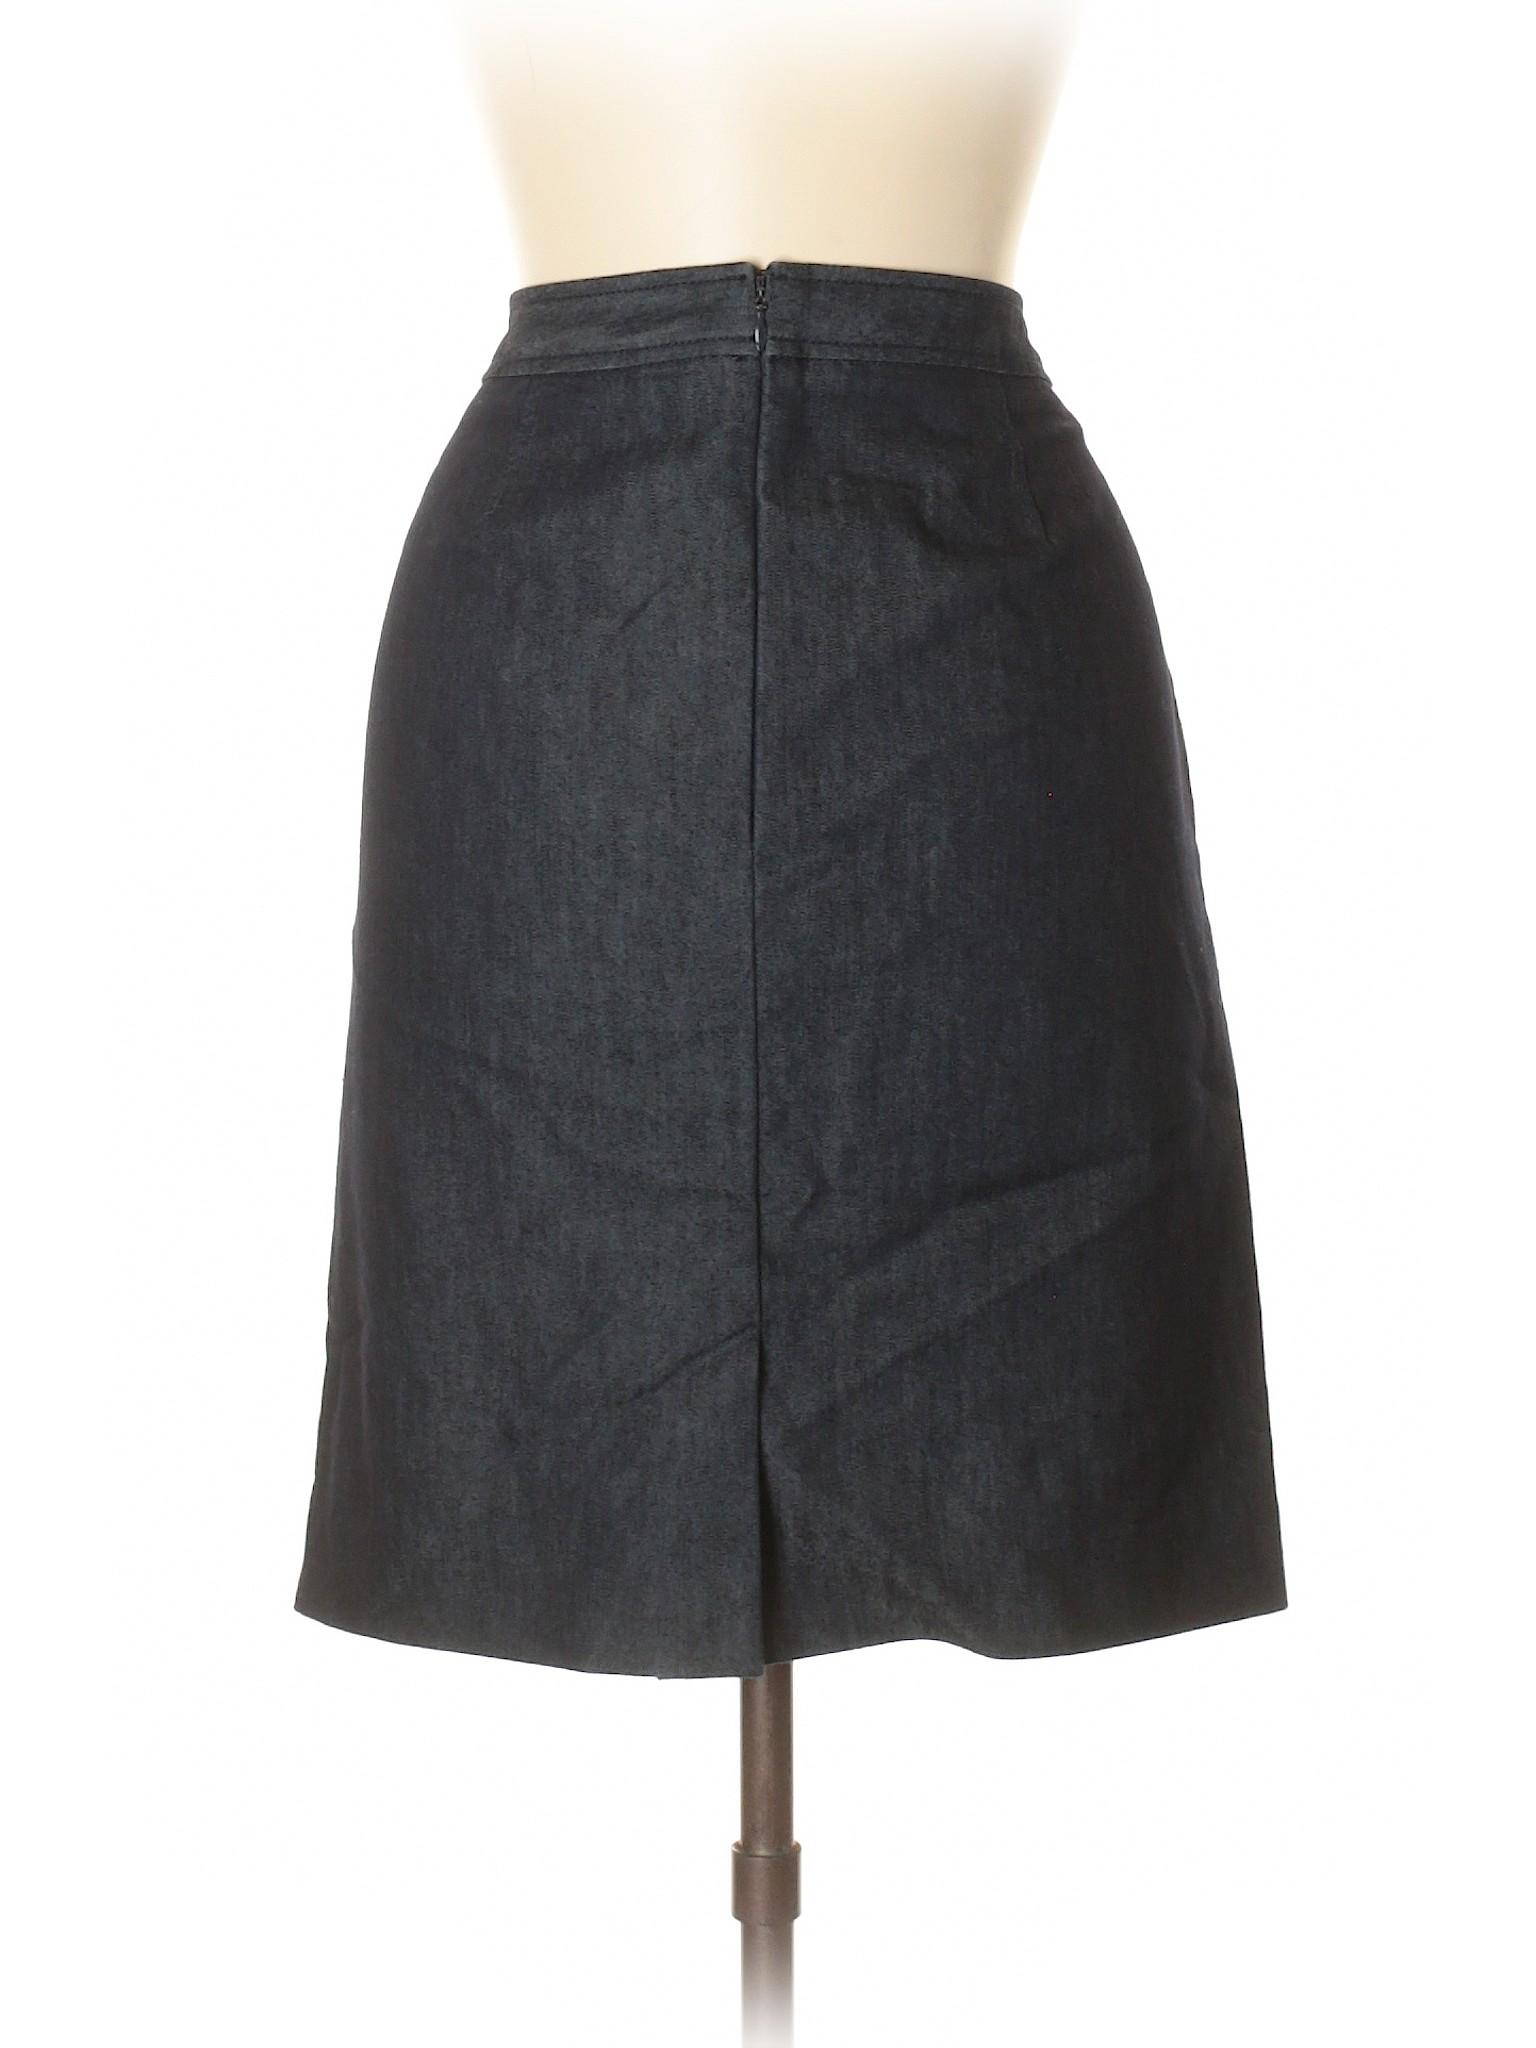 Boutique Denim Skirt Denim Boutique Skirt Boutique nnSUYq